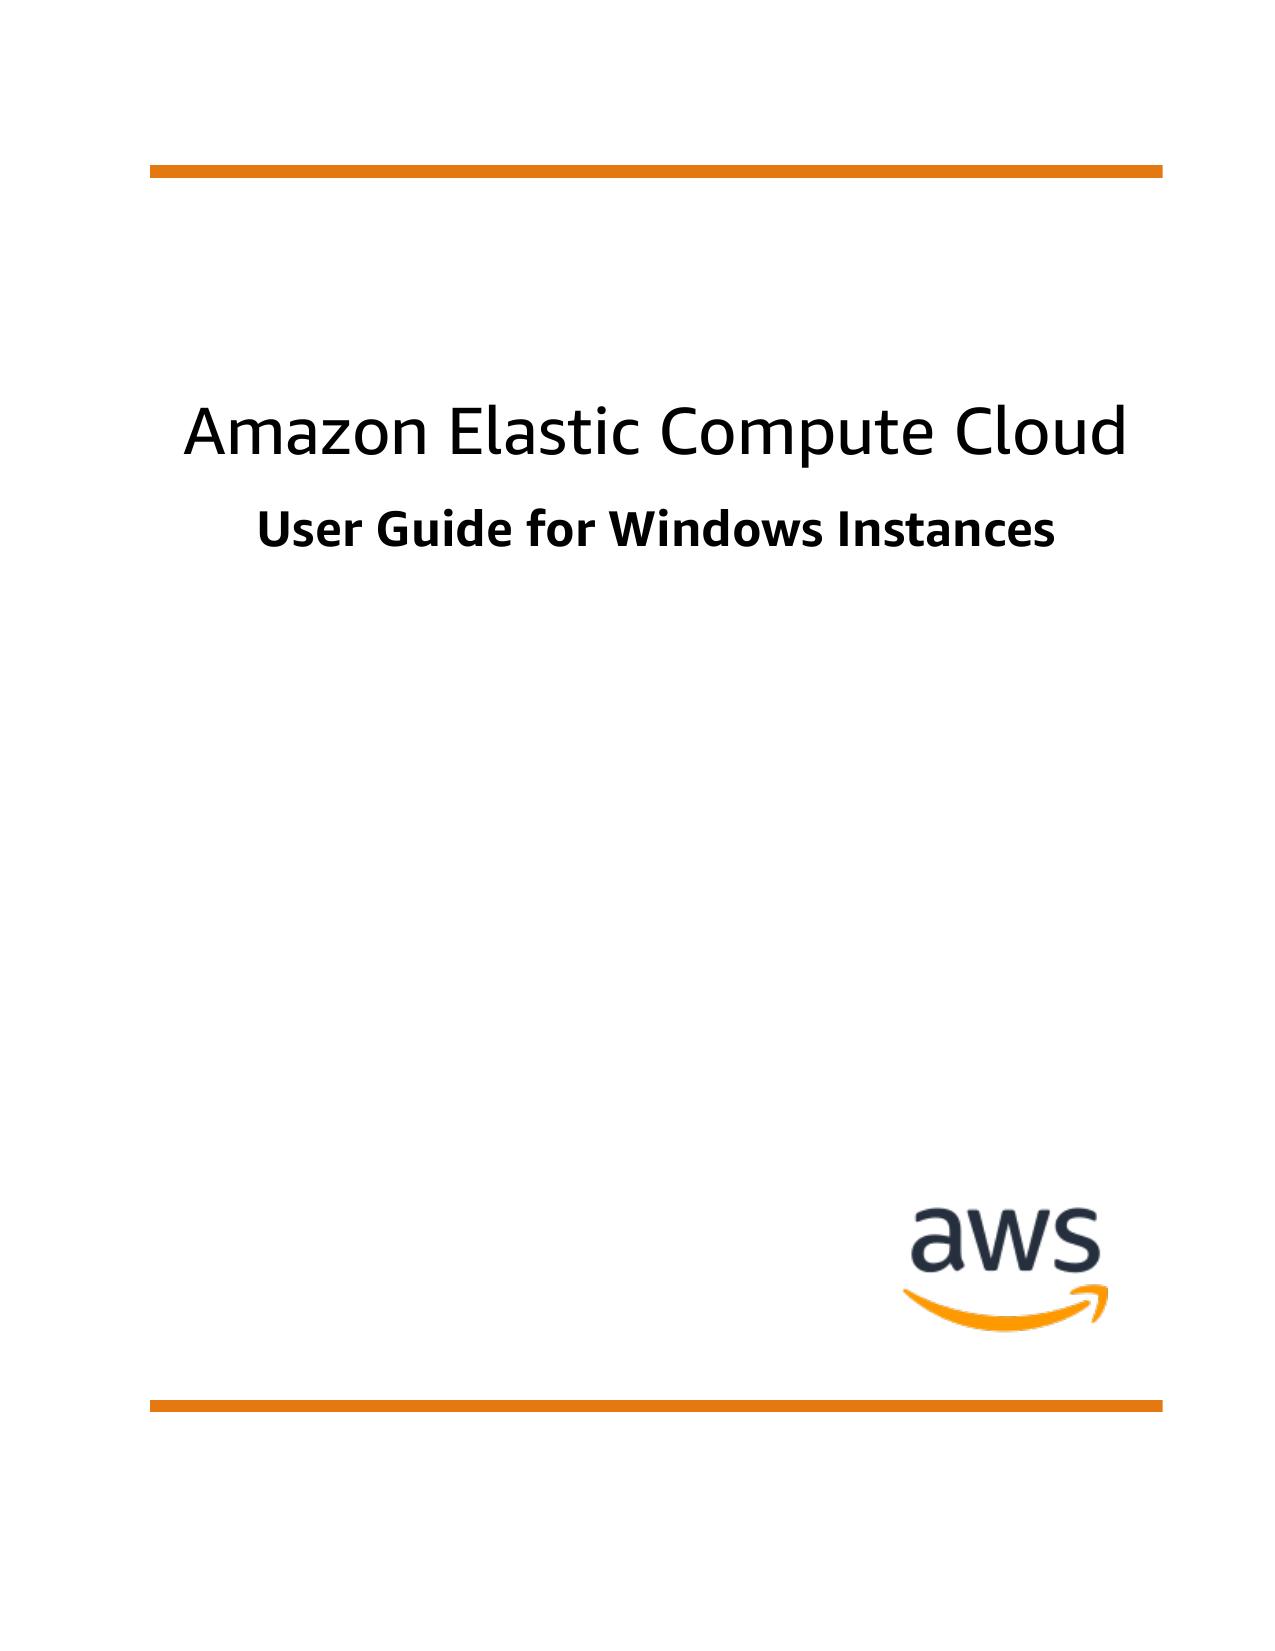 Amazon Elastic Compute Cloud - User Guide for Windows